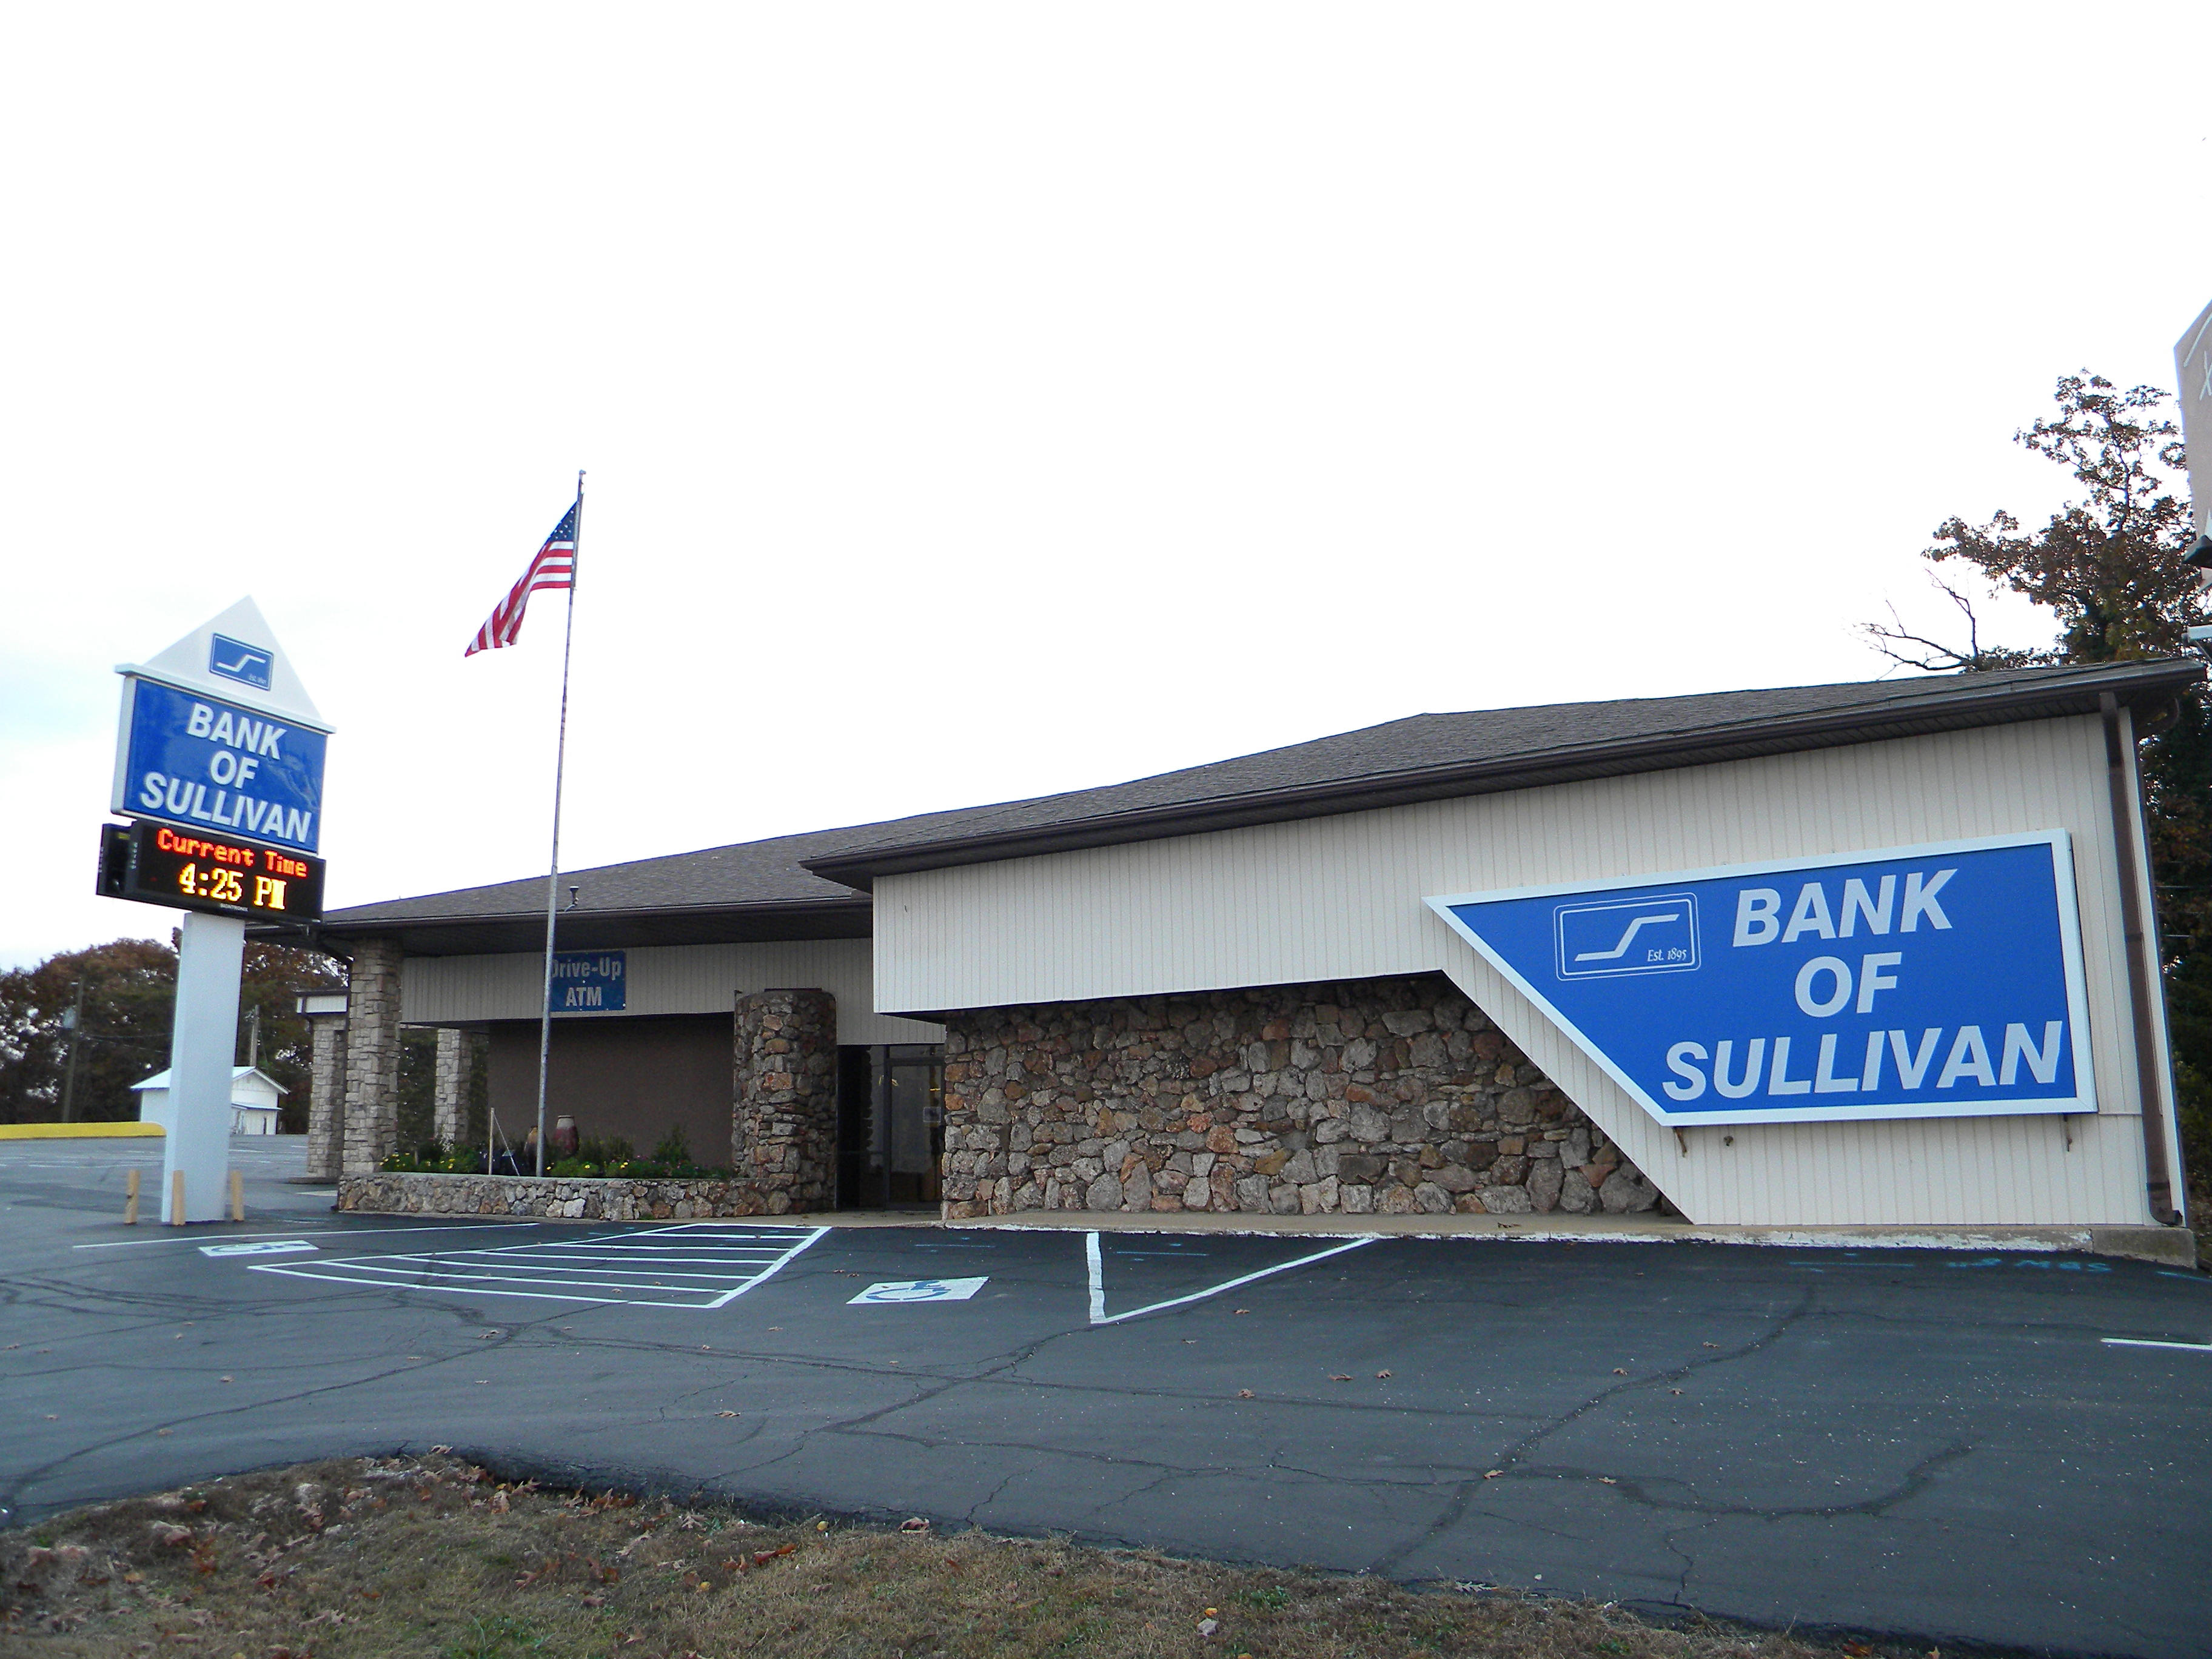 Bank Of Sullivan image 1